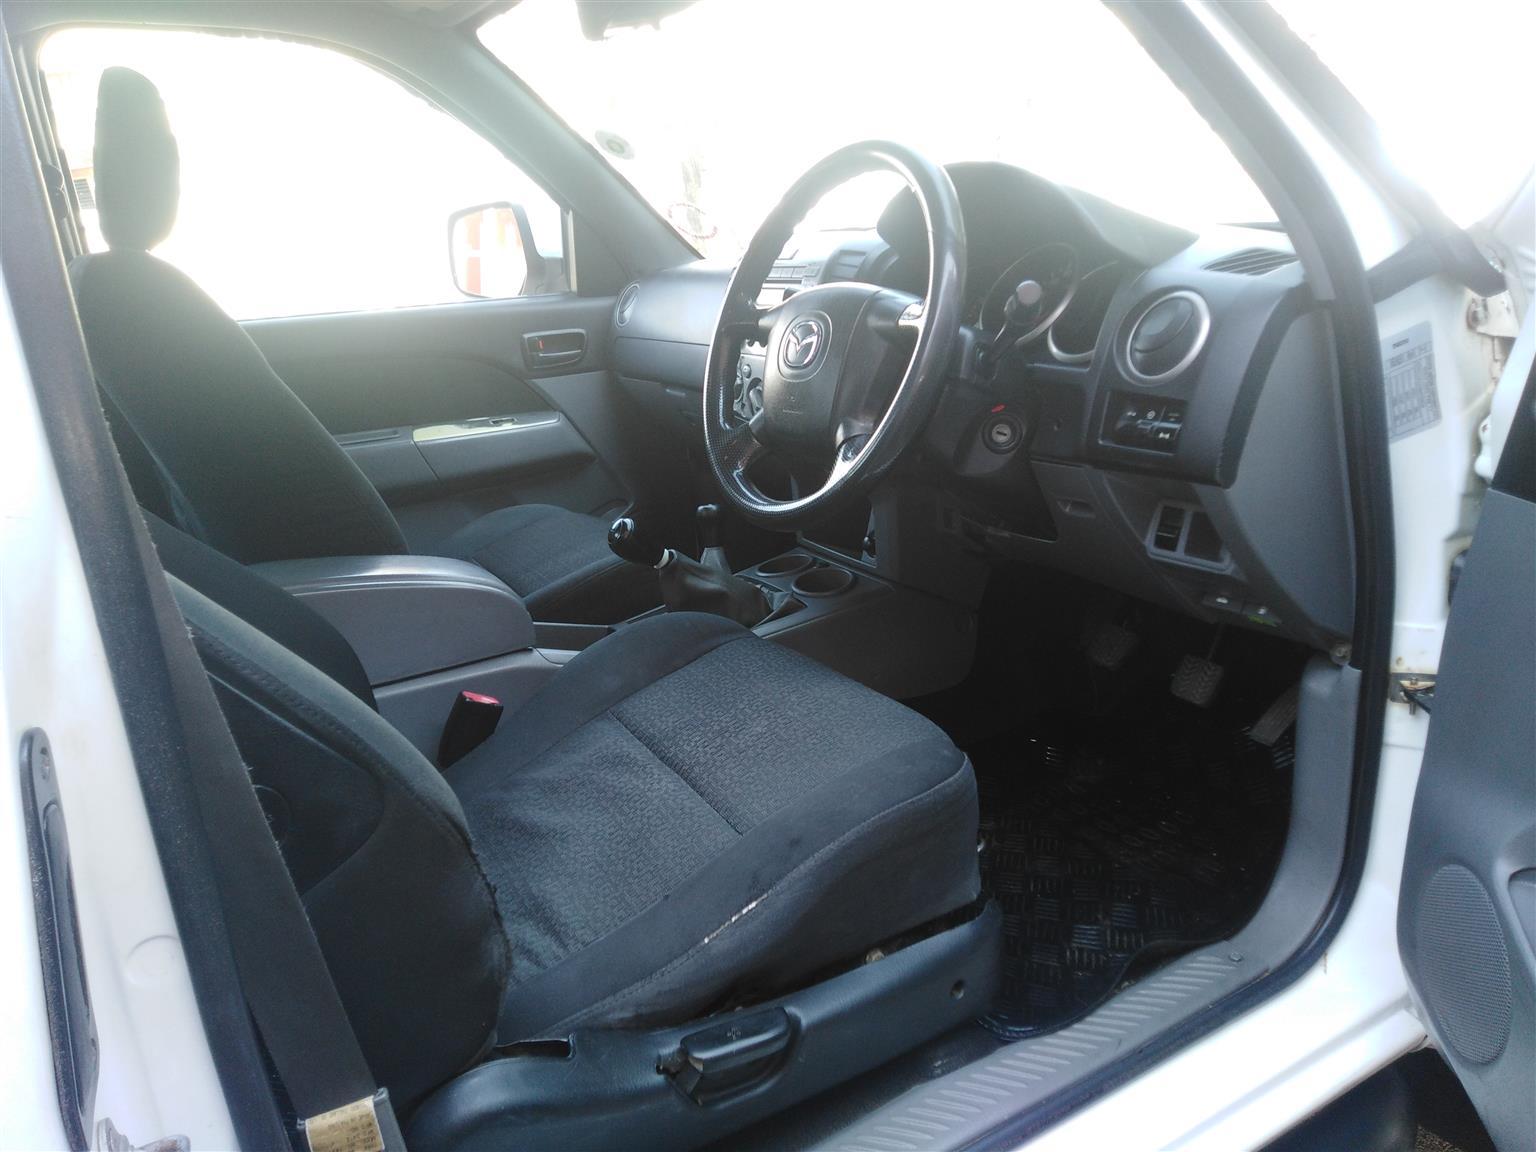 2011 Mazda BT-50 2.5 double cab SLX